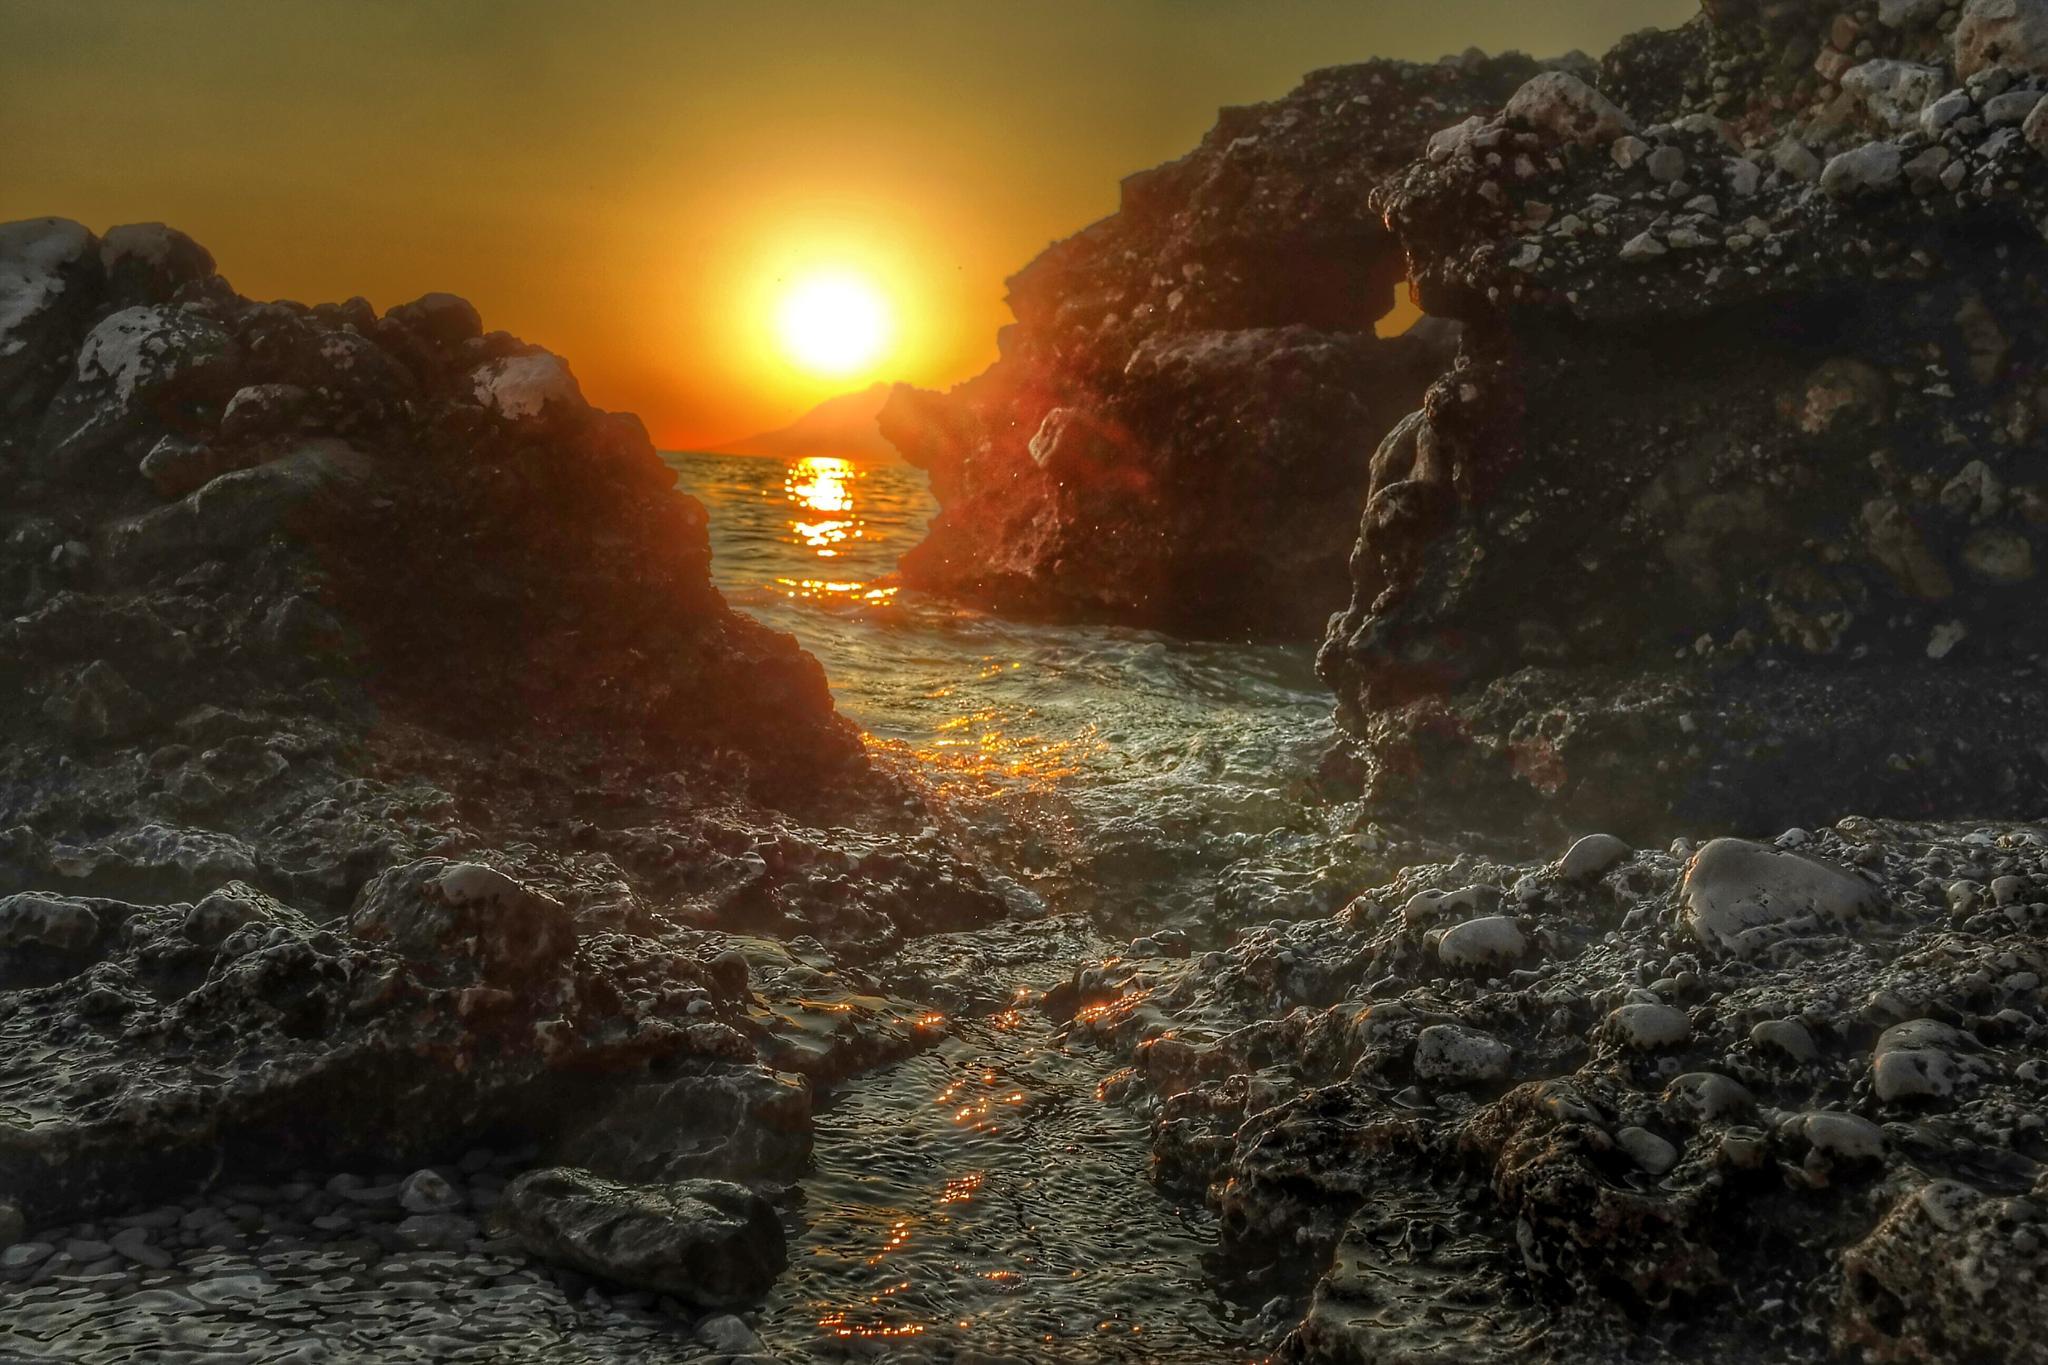 Sunset over the cliffs at the beach in Baska Voda by Stefan Schnöpf